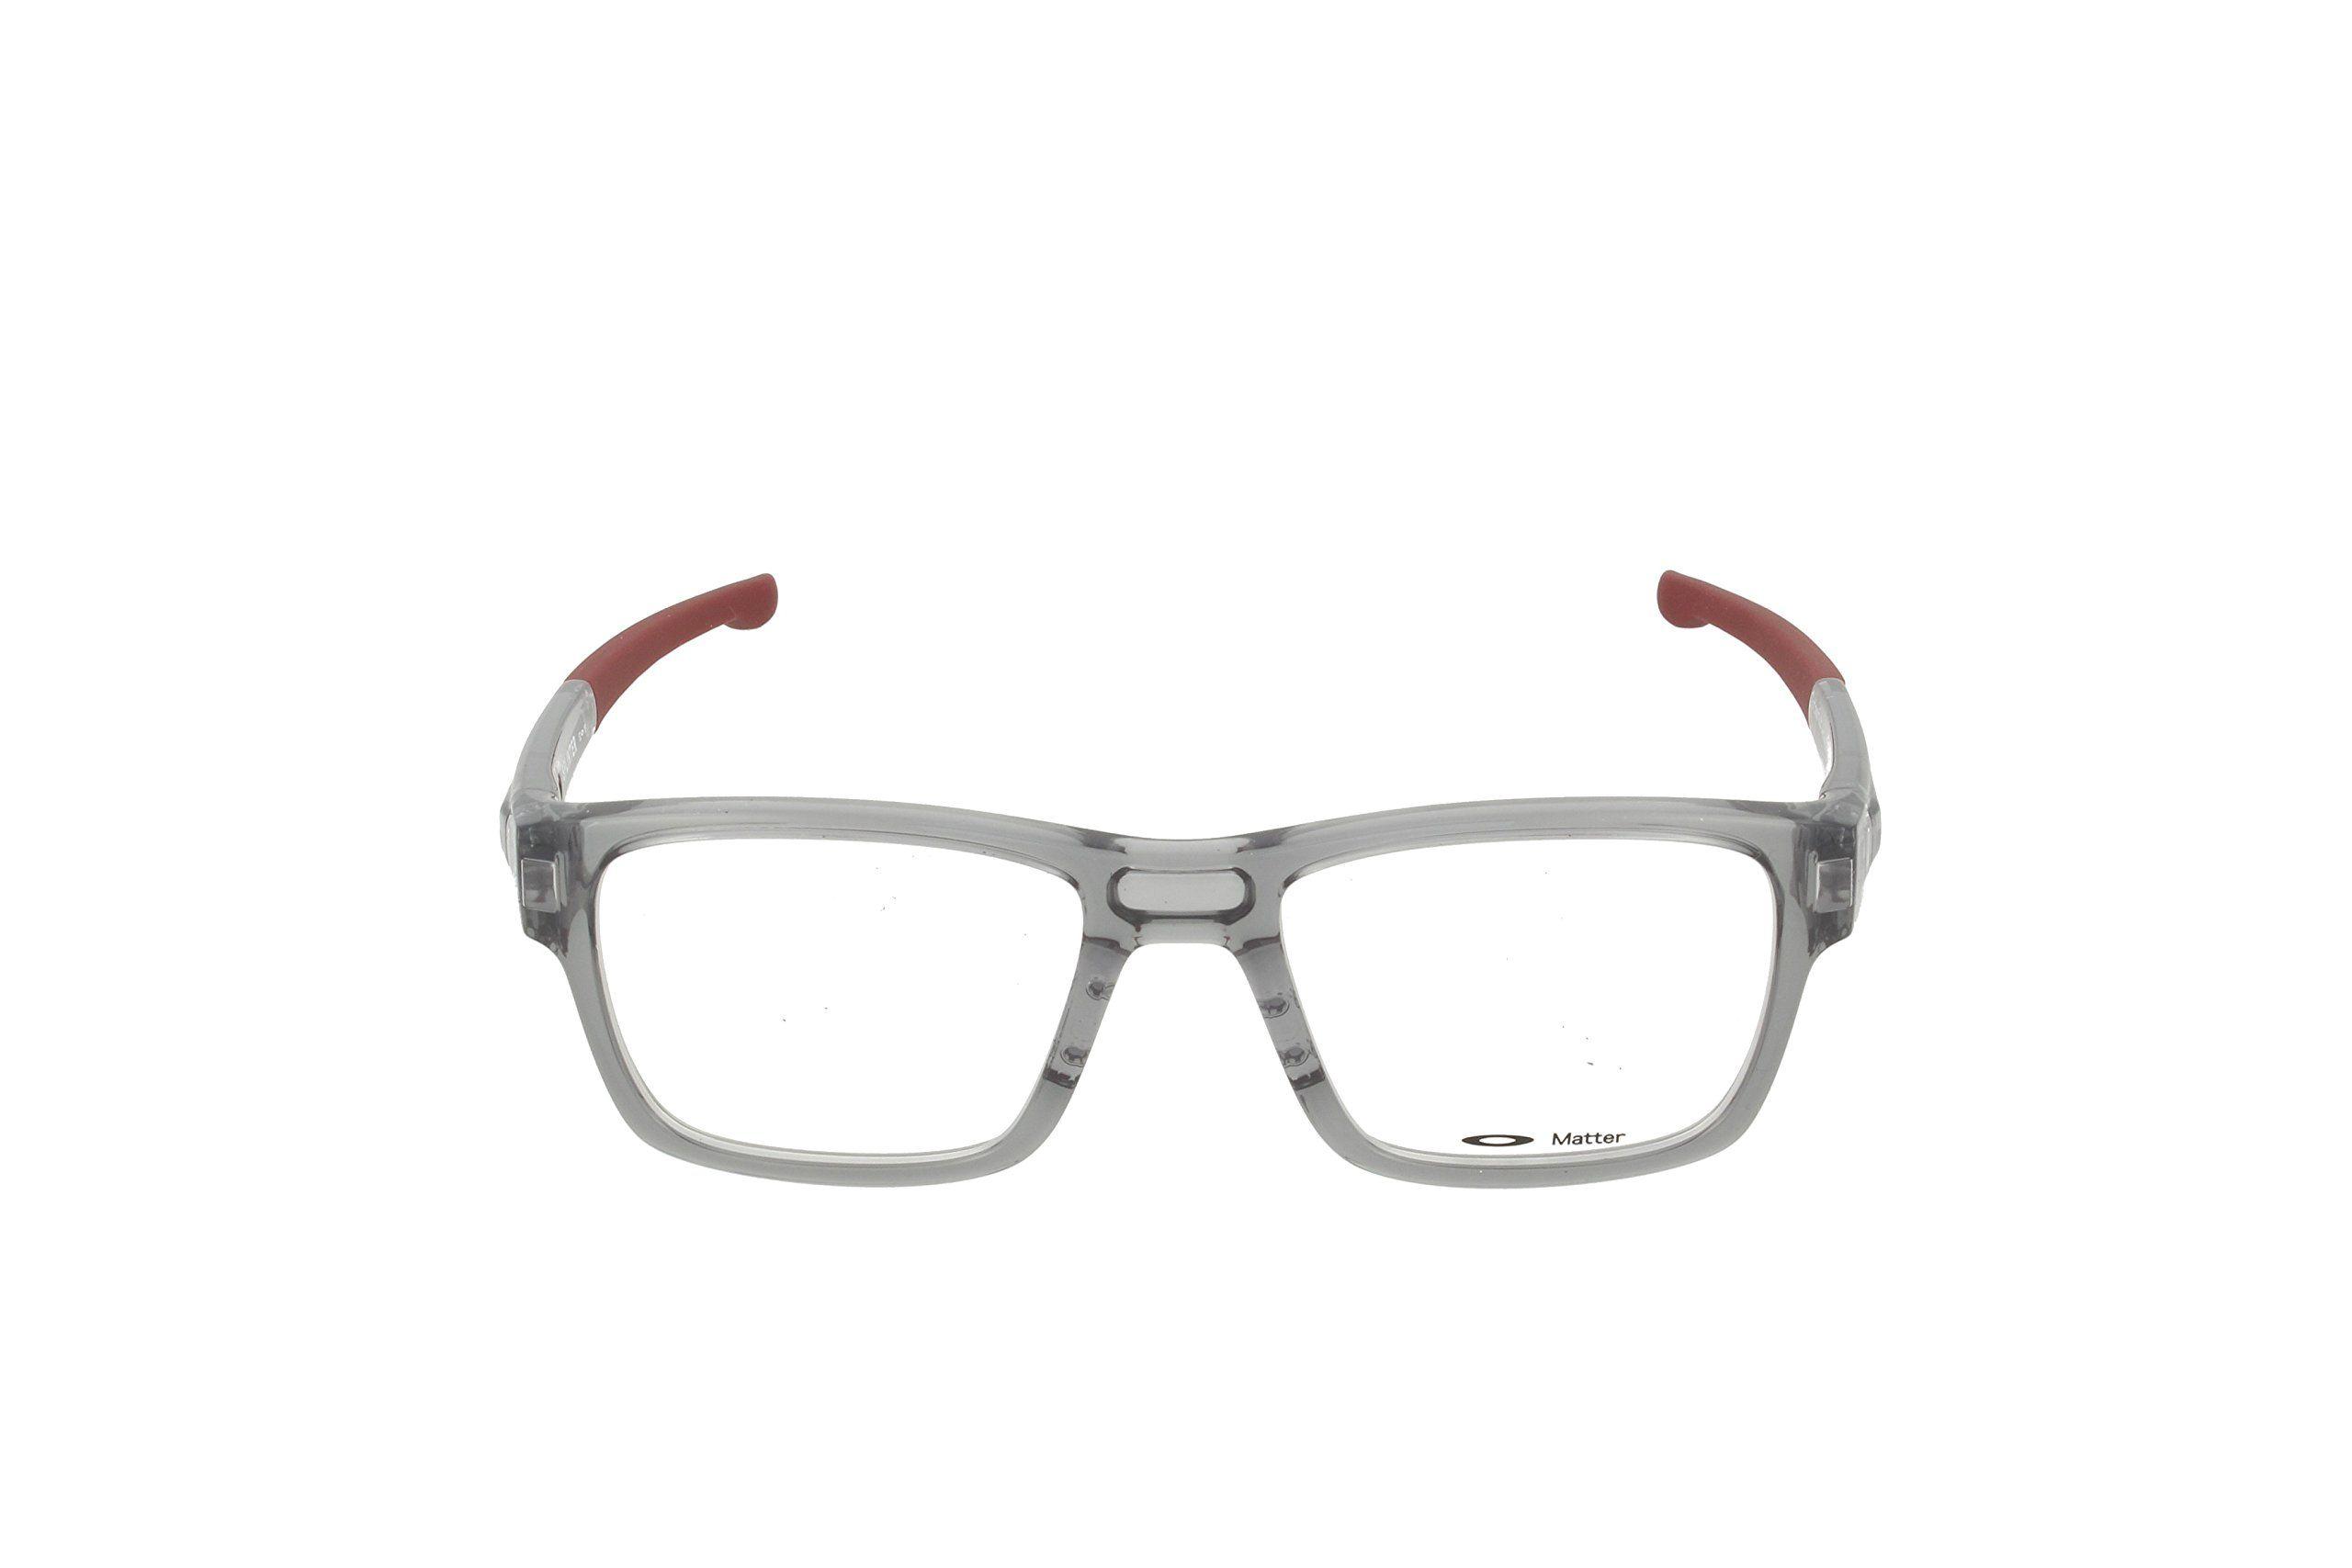 99fbfad5d3 OAKLEY Airdrop OX 807703 Eyeglasses Grey 52mm   Click image for more details.(It  is Amazon affiliate link)  MenEyeWearIdeas